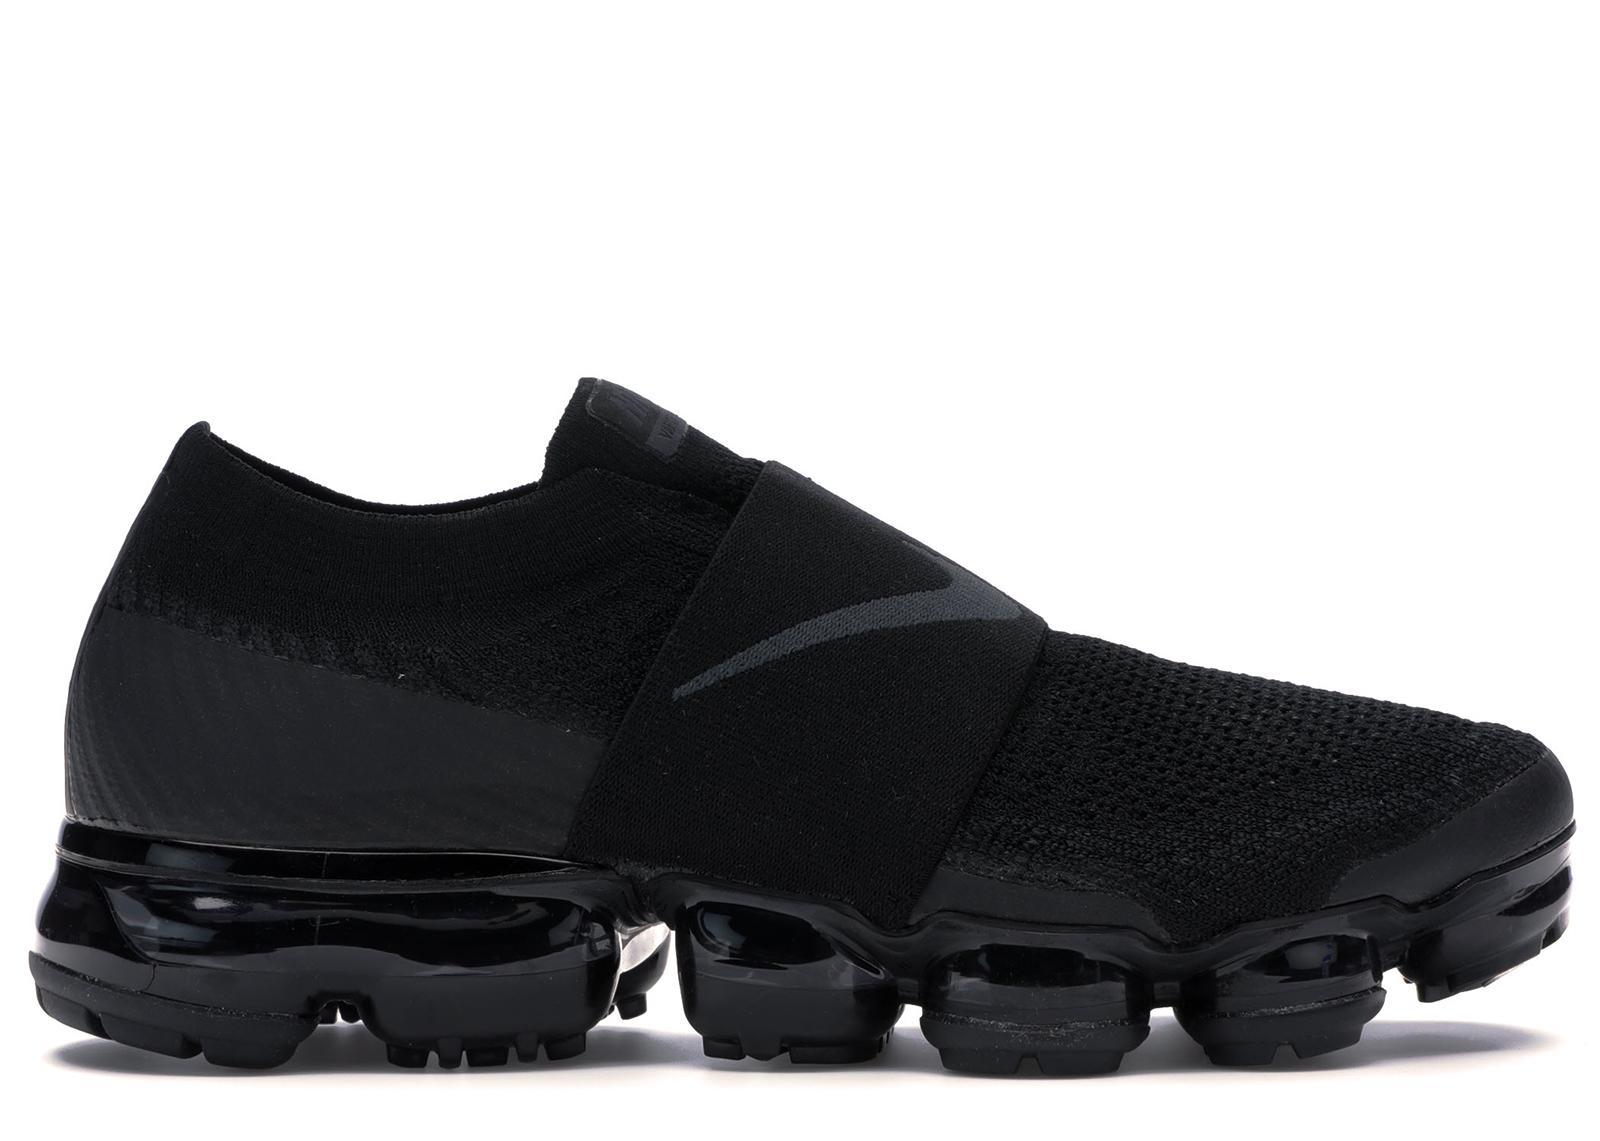 Nike Air VaporMax Moc Triple Black - AH3397-004